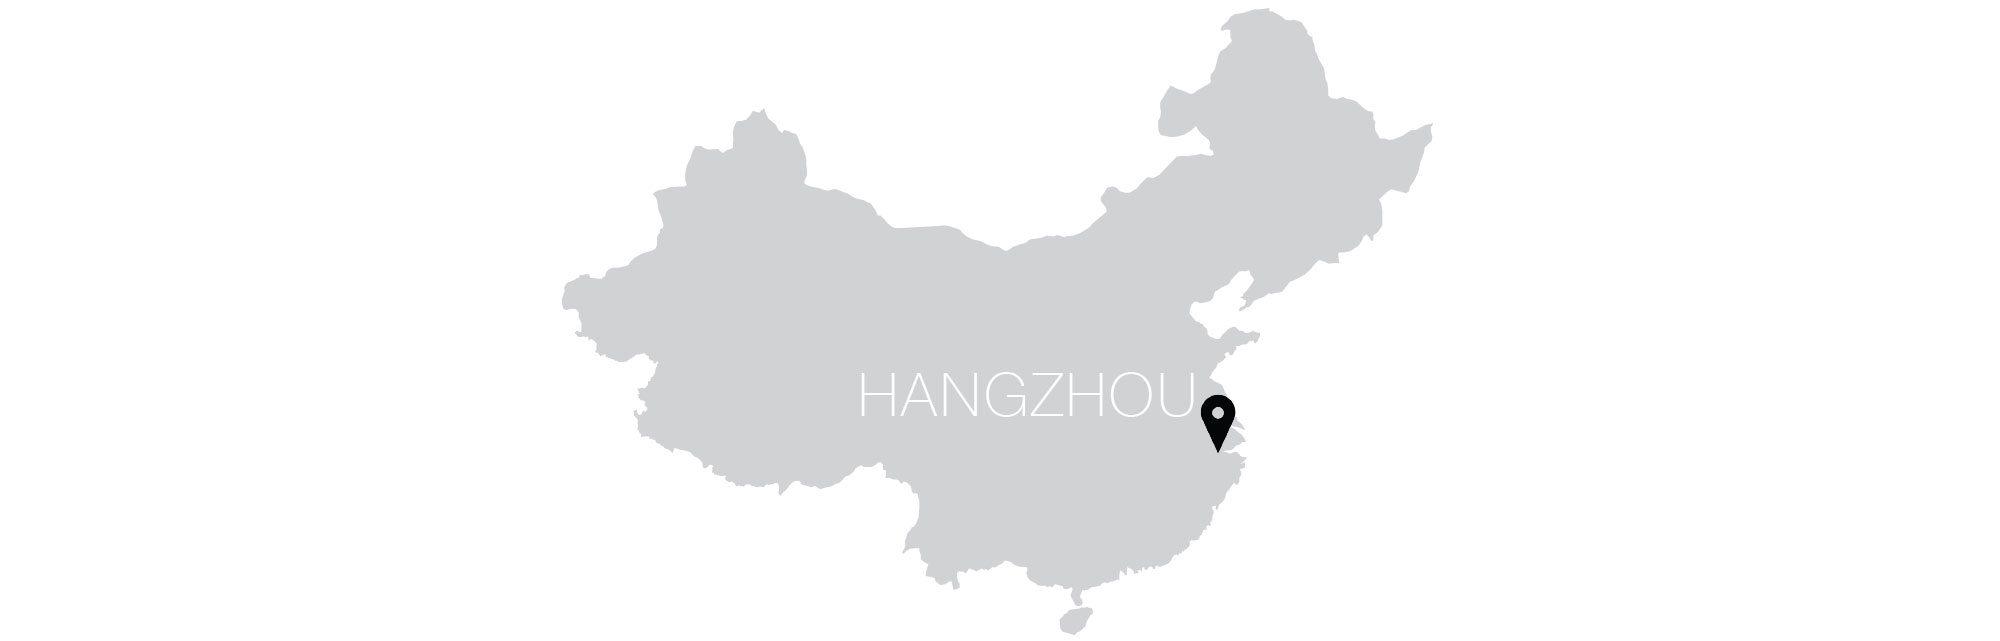 Hangzhou Opener